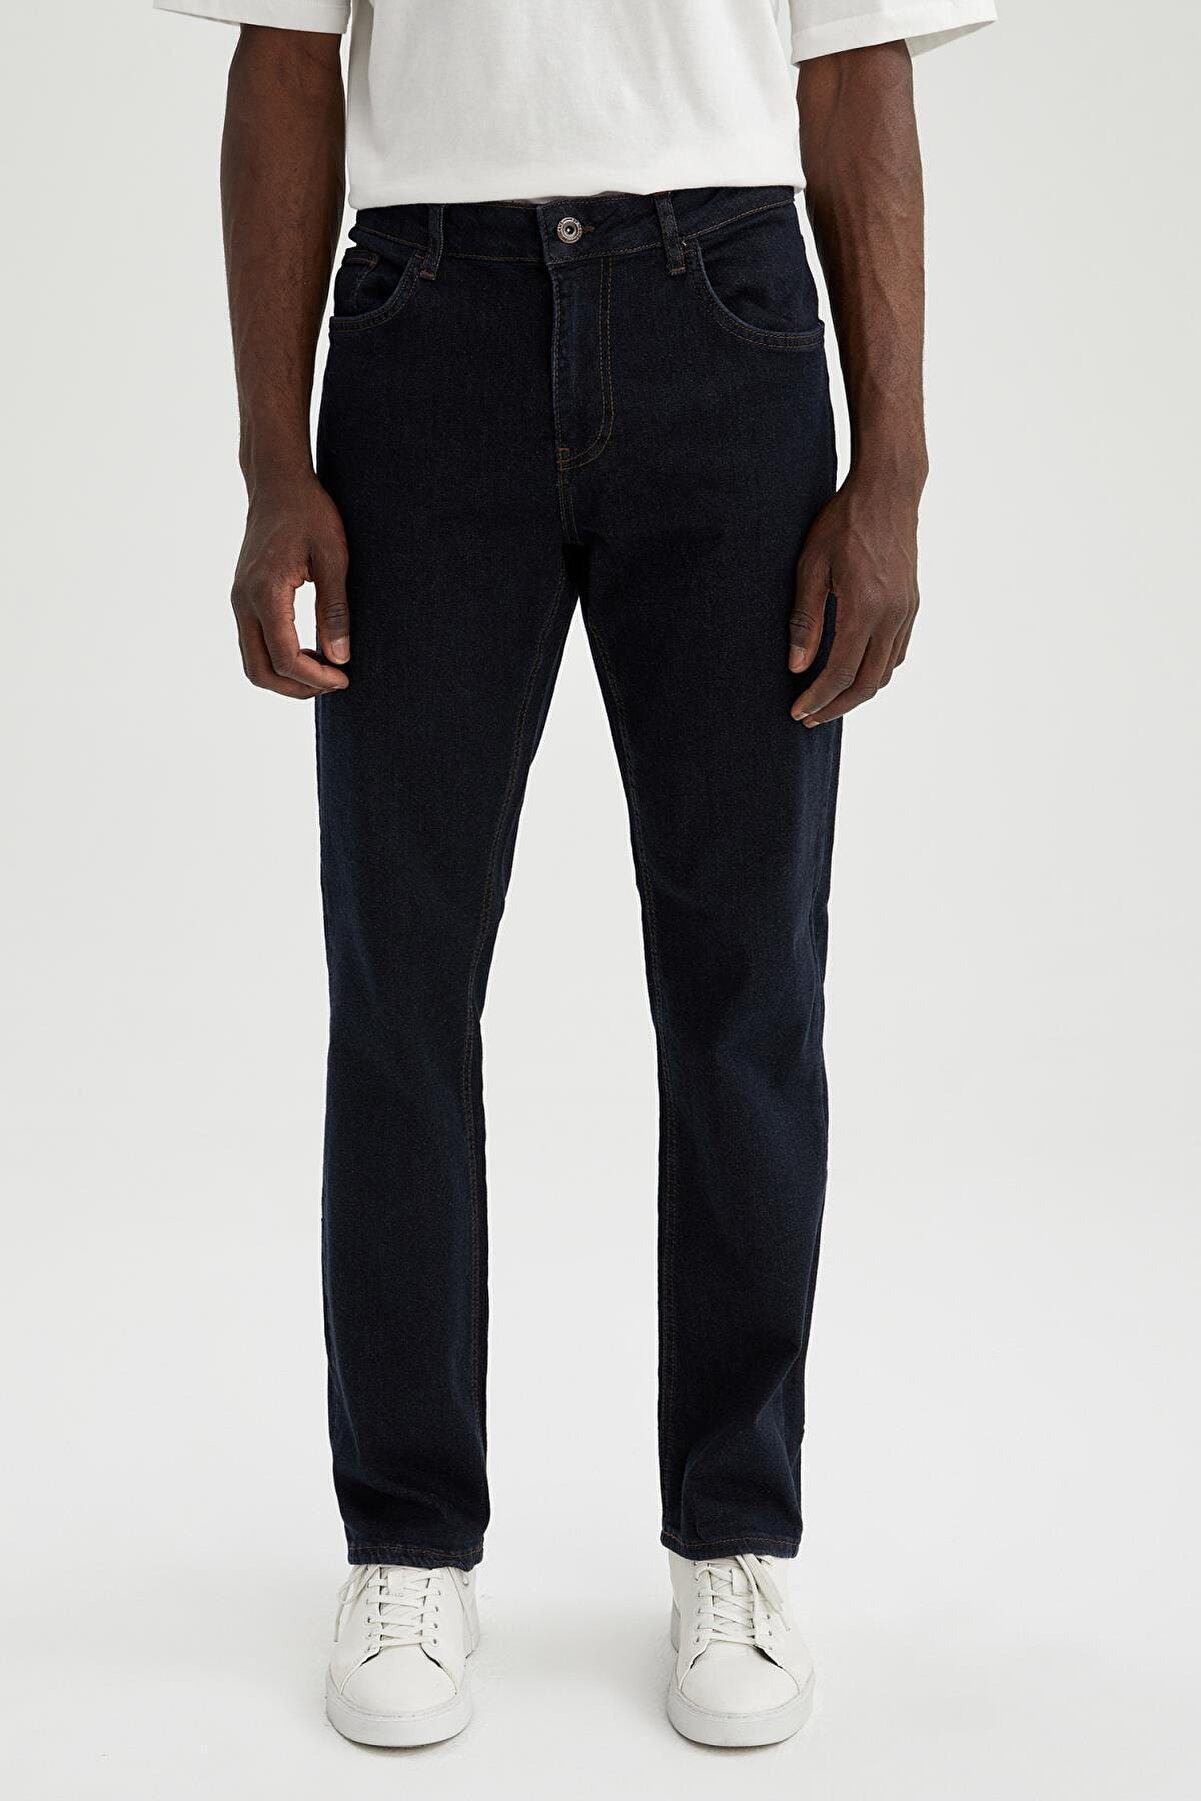 Defacto Comfort Fit Normal Bel Boru Paça Jean Pantolon